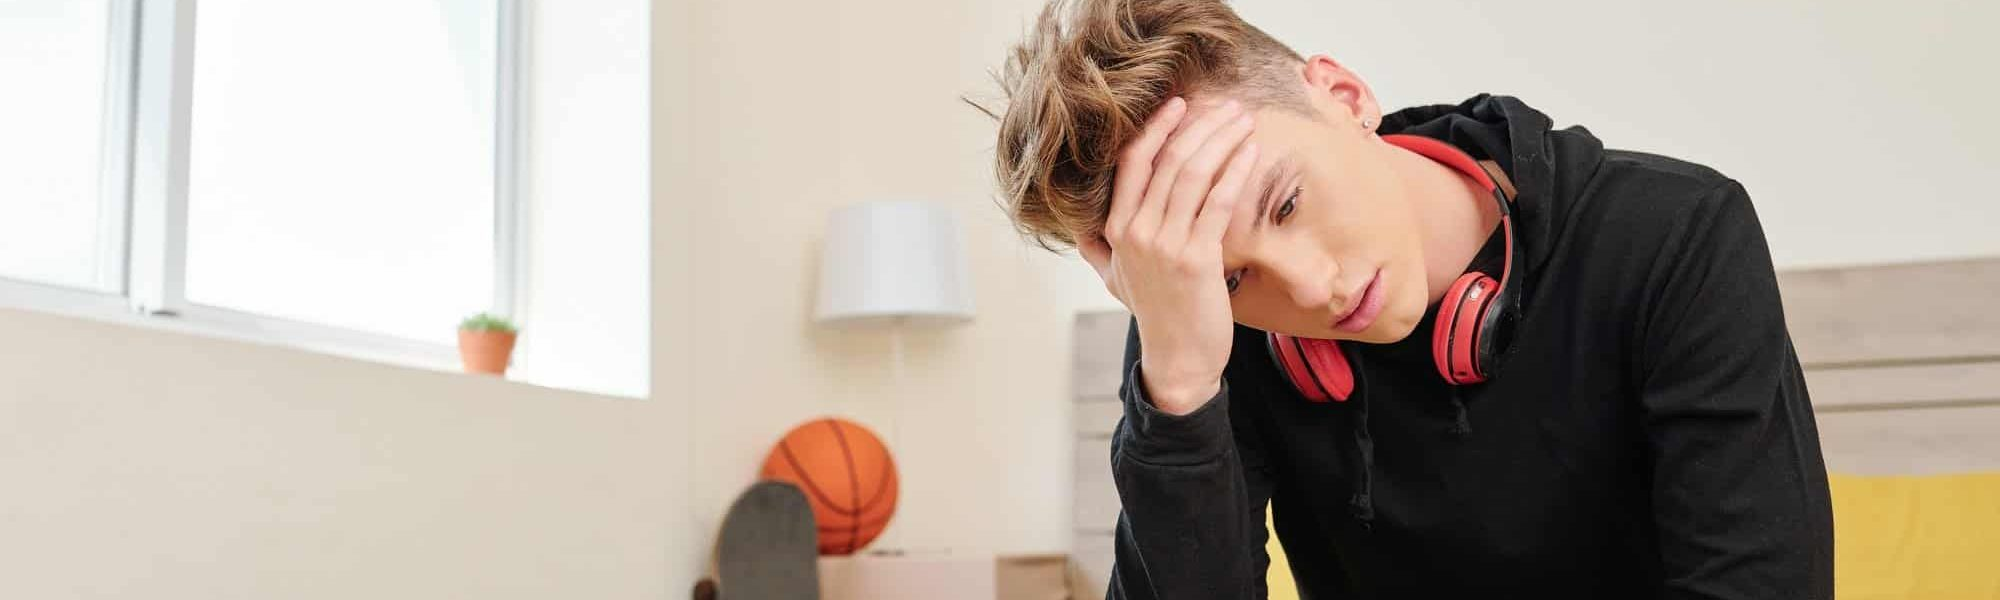 Boy suffering from headache